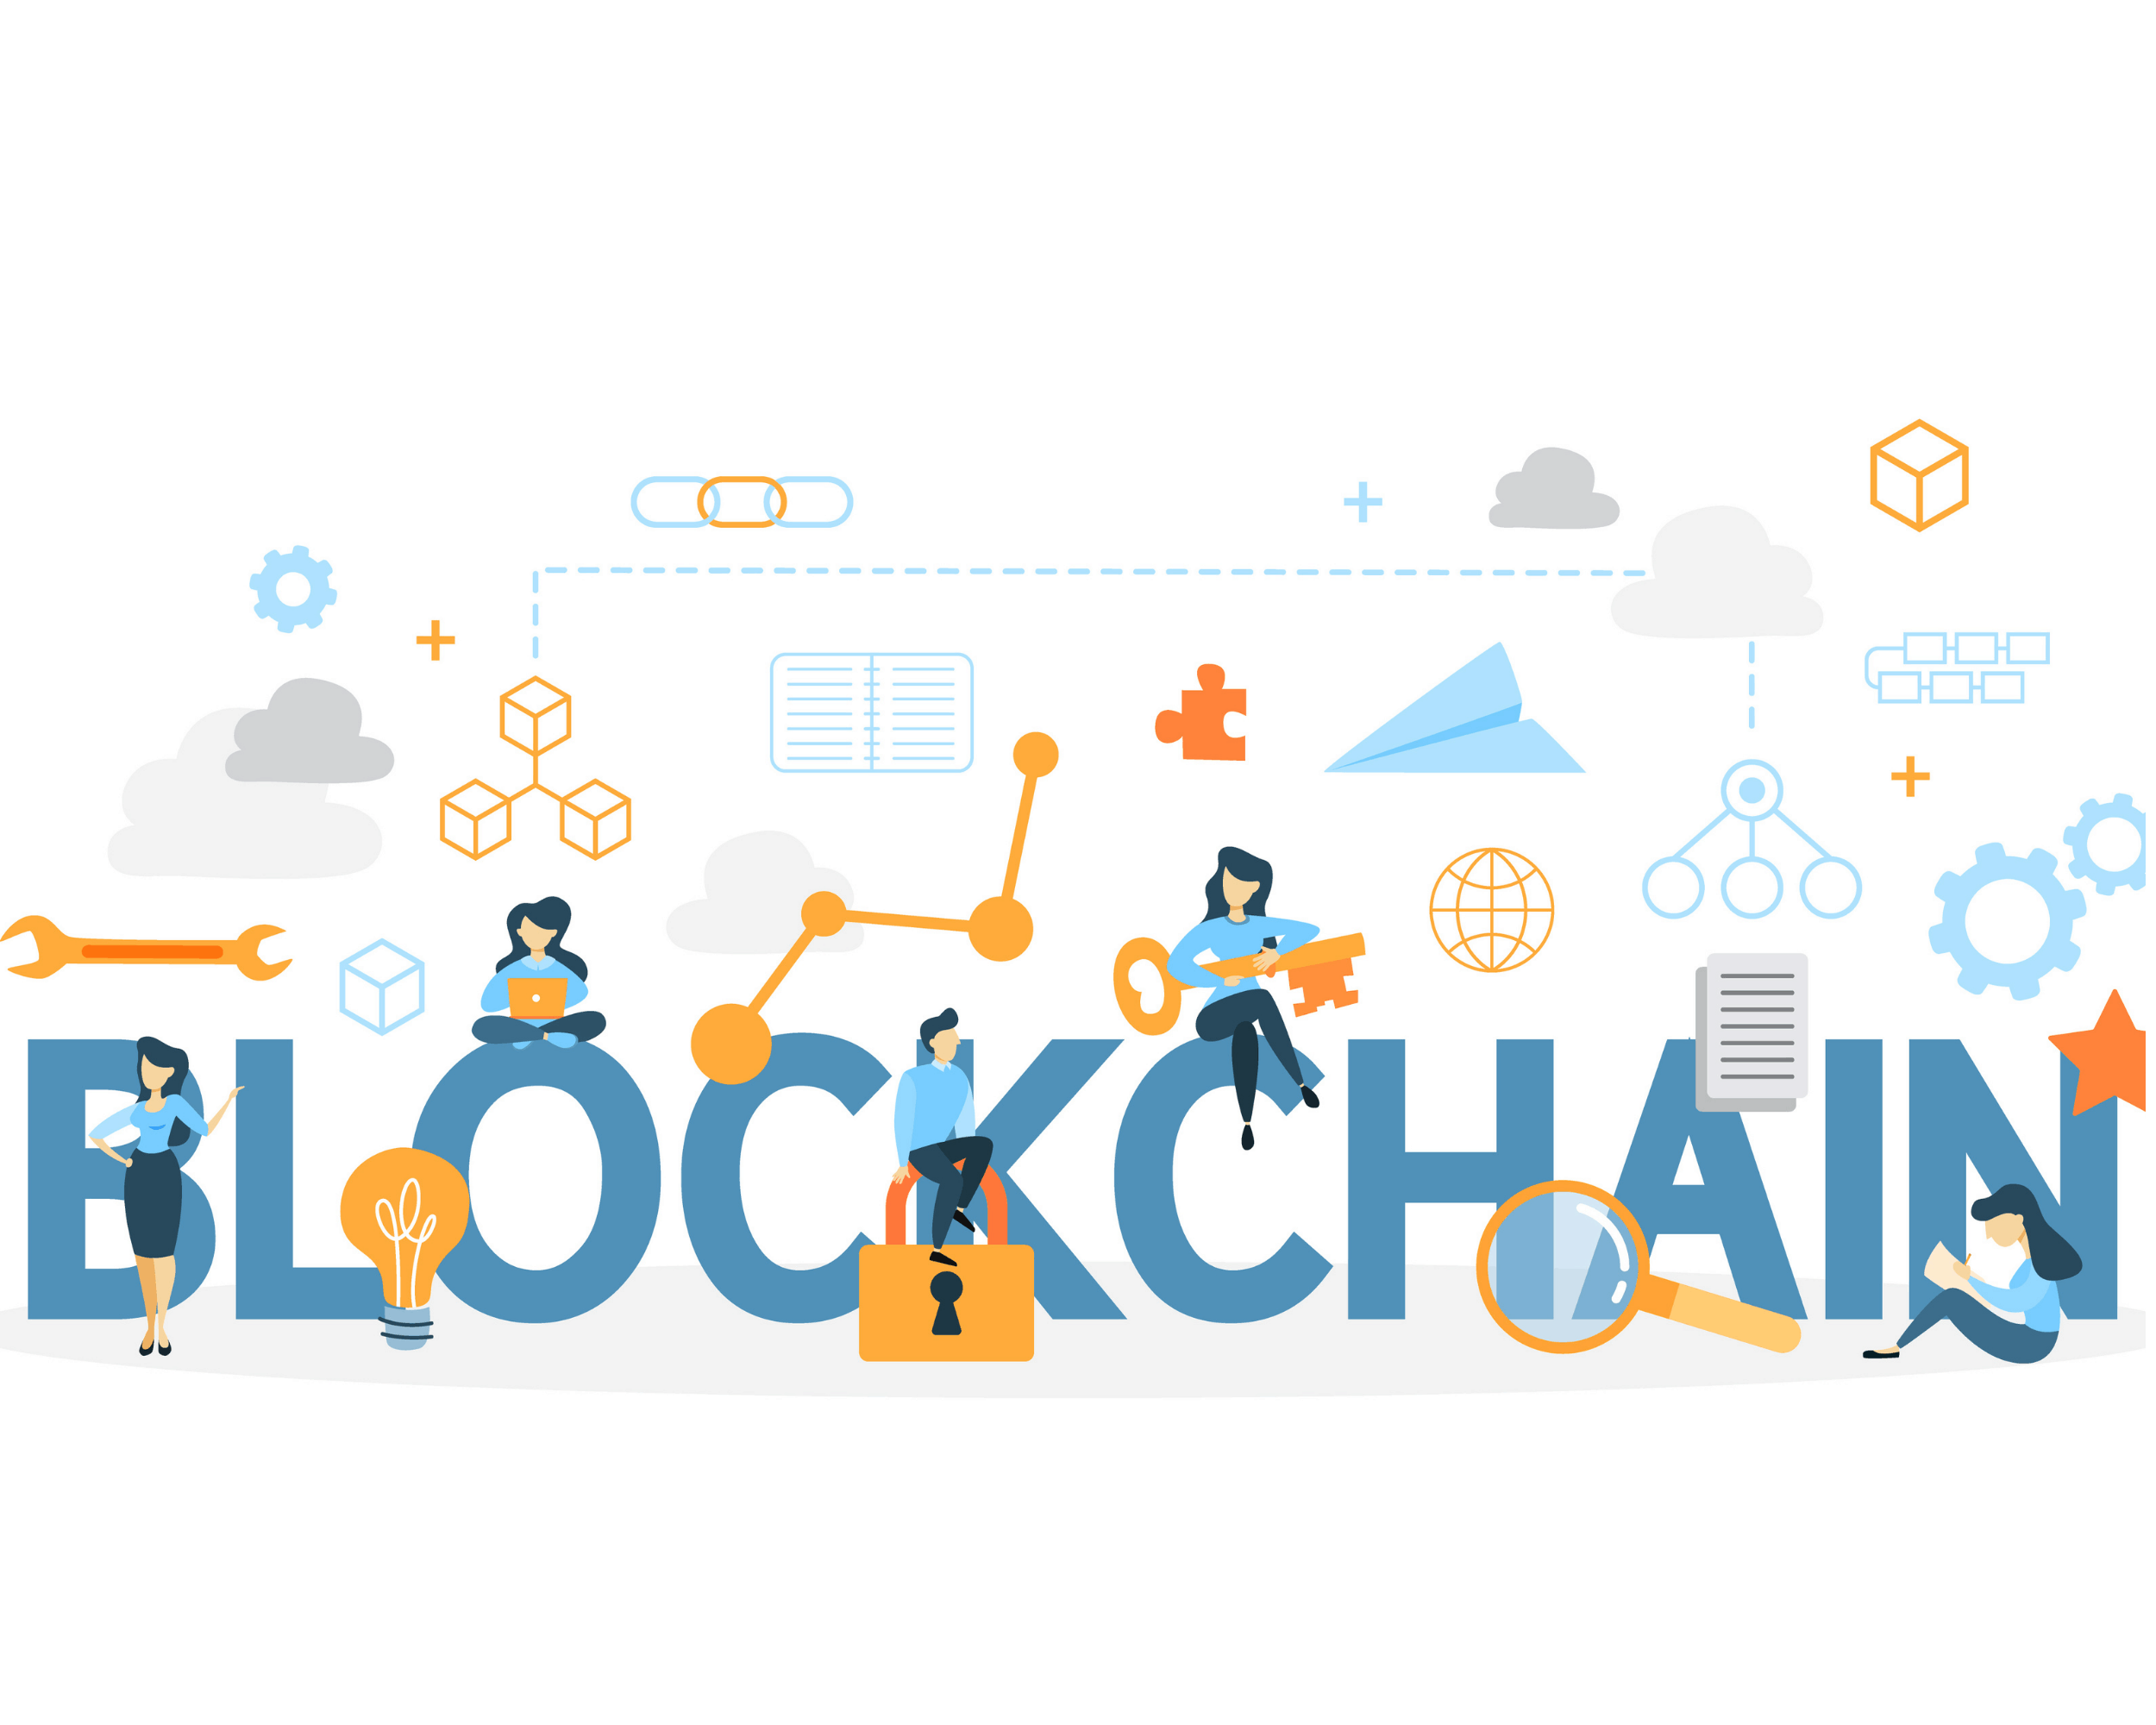 seguridad de la blockchain